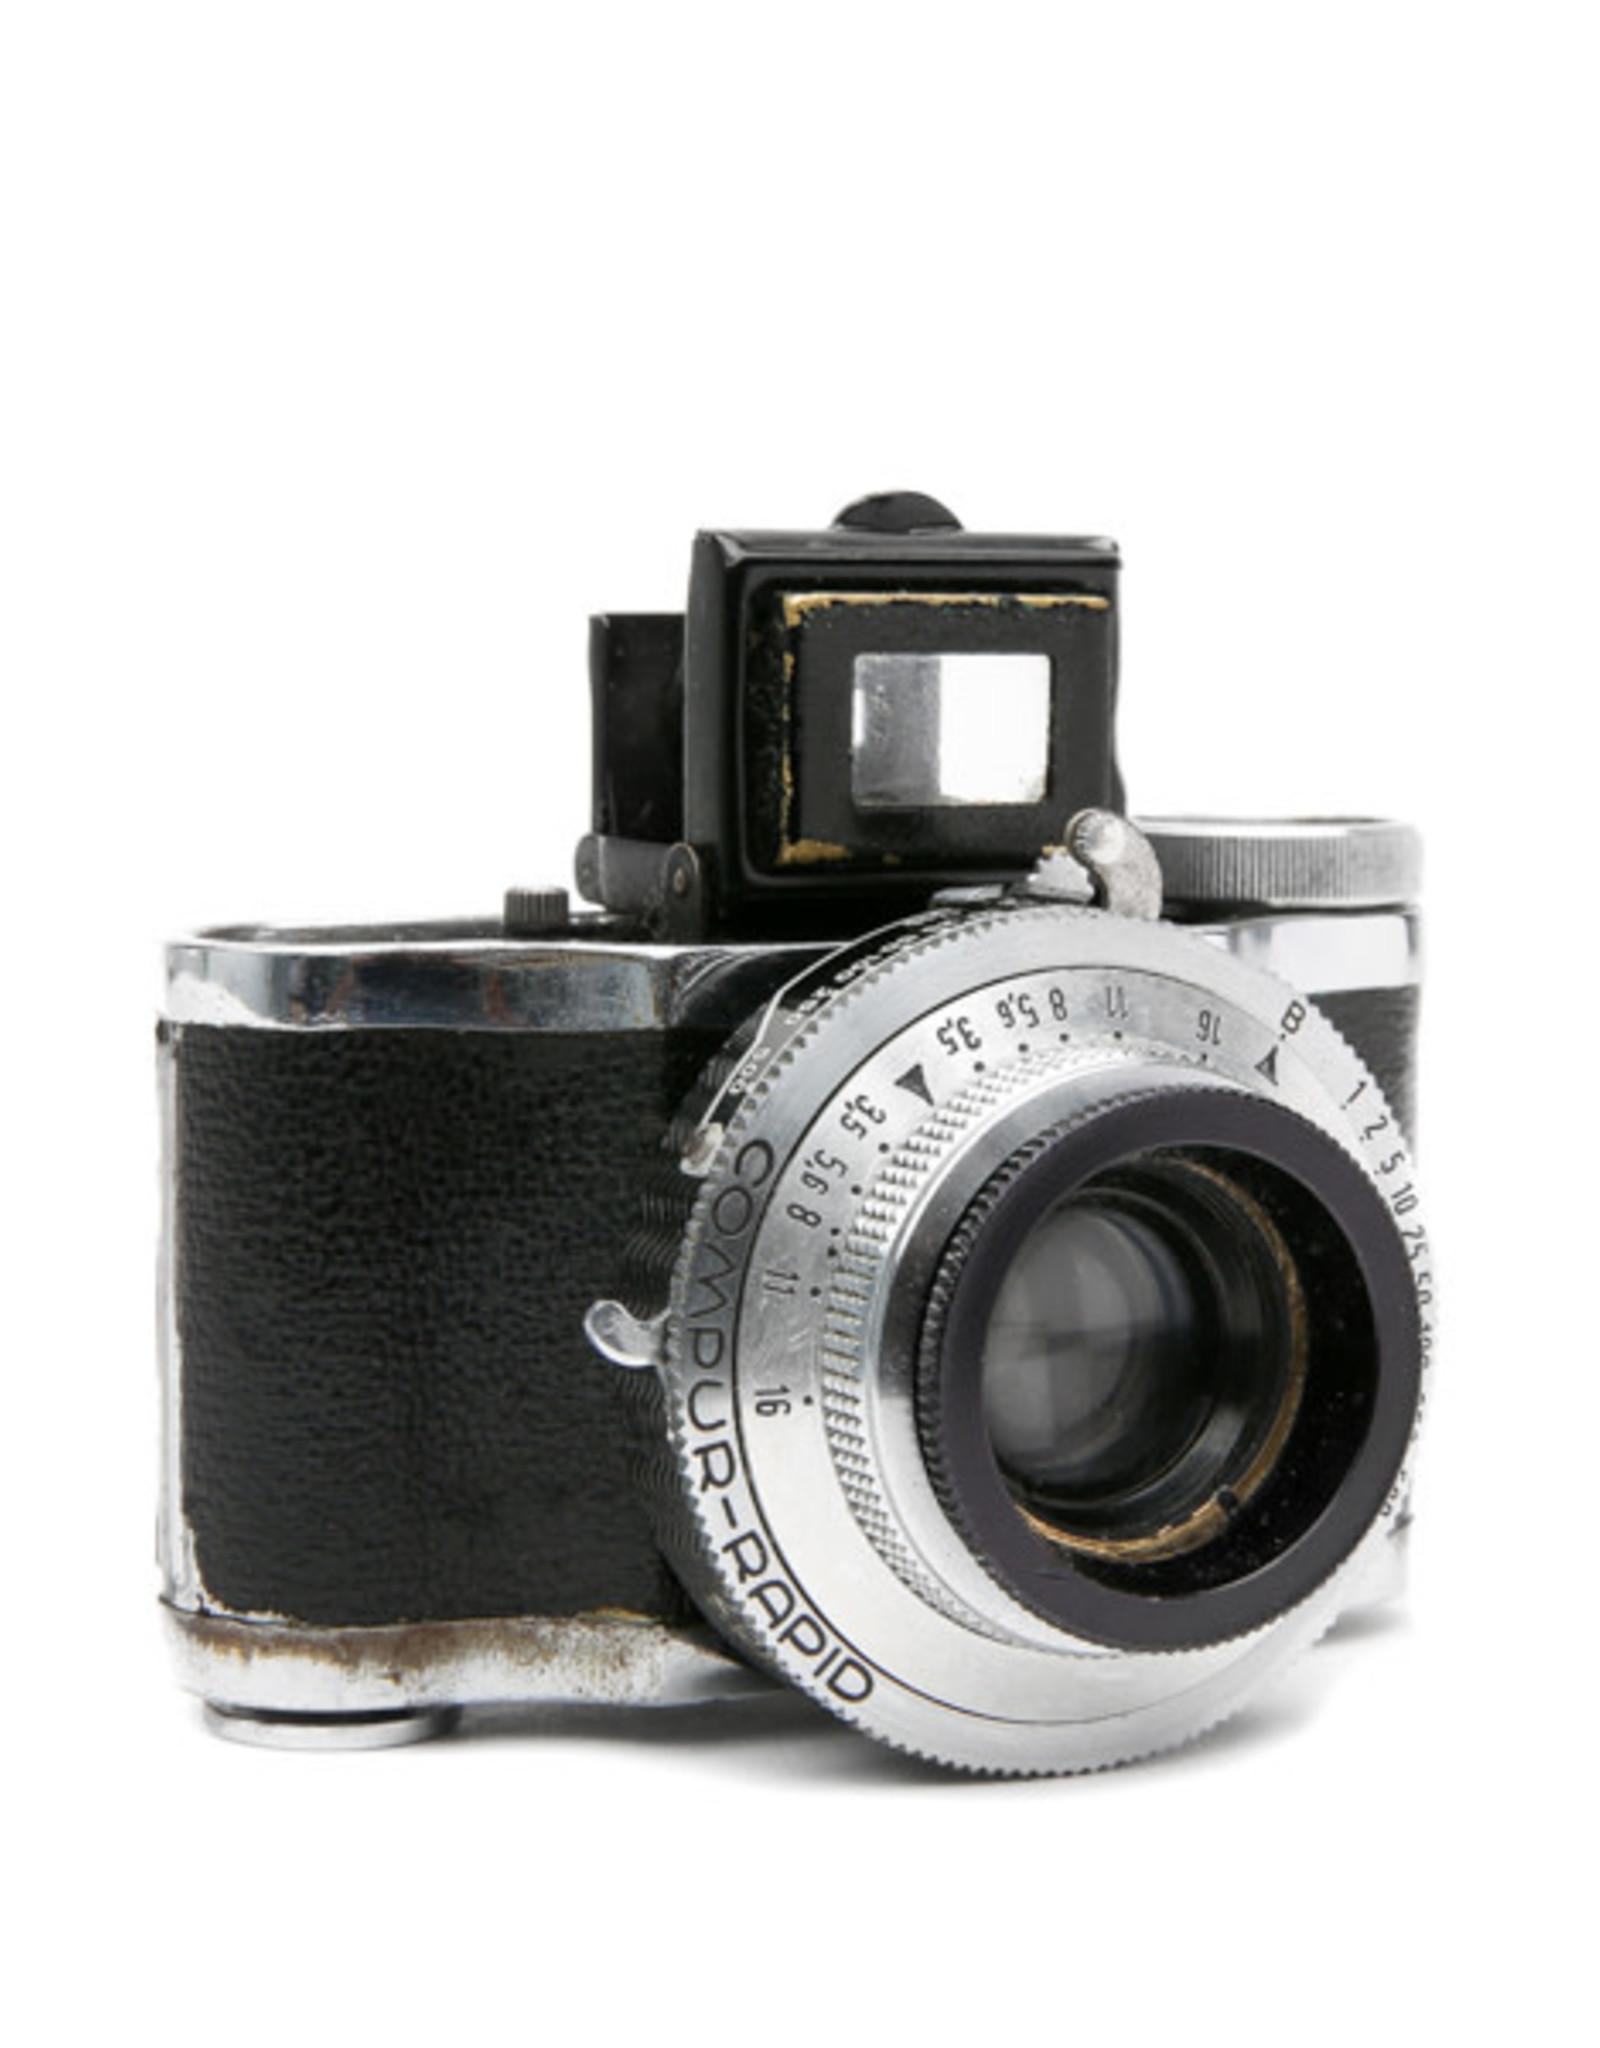 ELJY ELJY Lumiere 35mm Sub-Miniature Camera